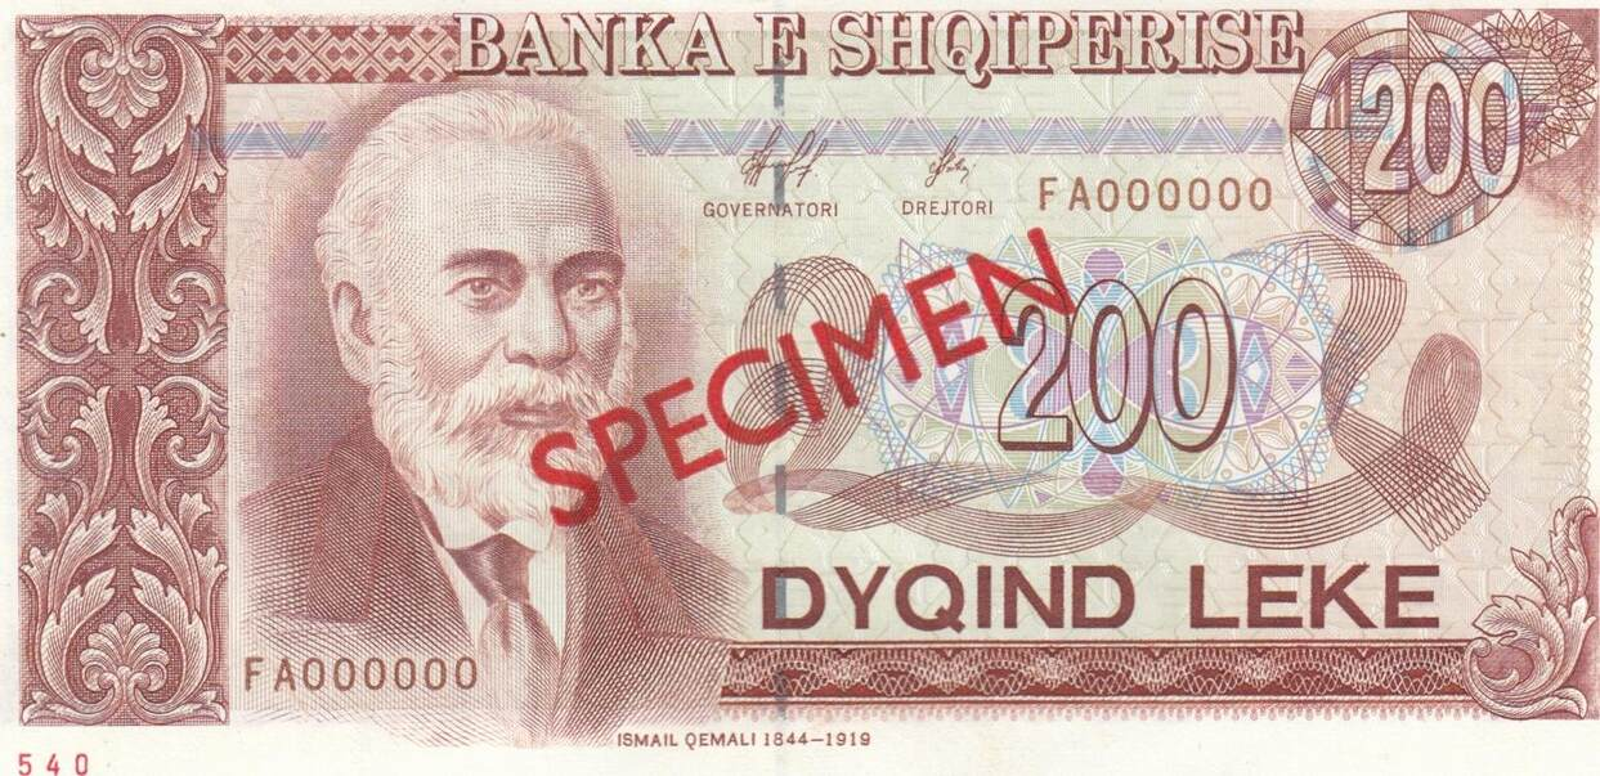 Albania Paper Money 200 LEK 2001 SPECIMEN  UNC